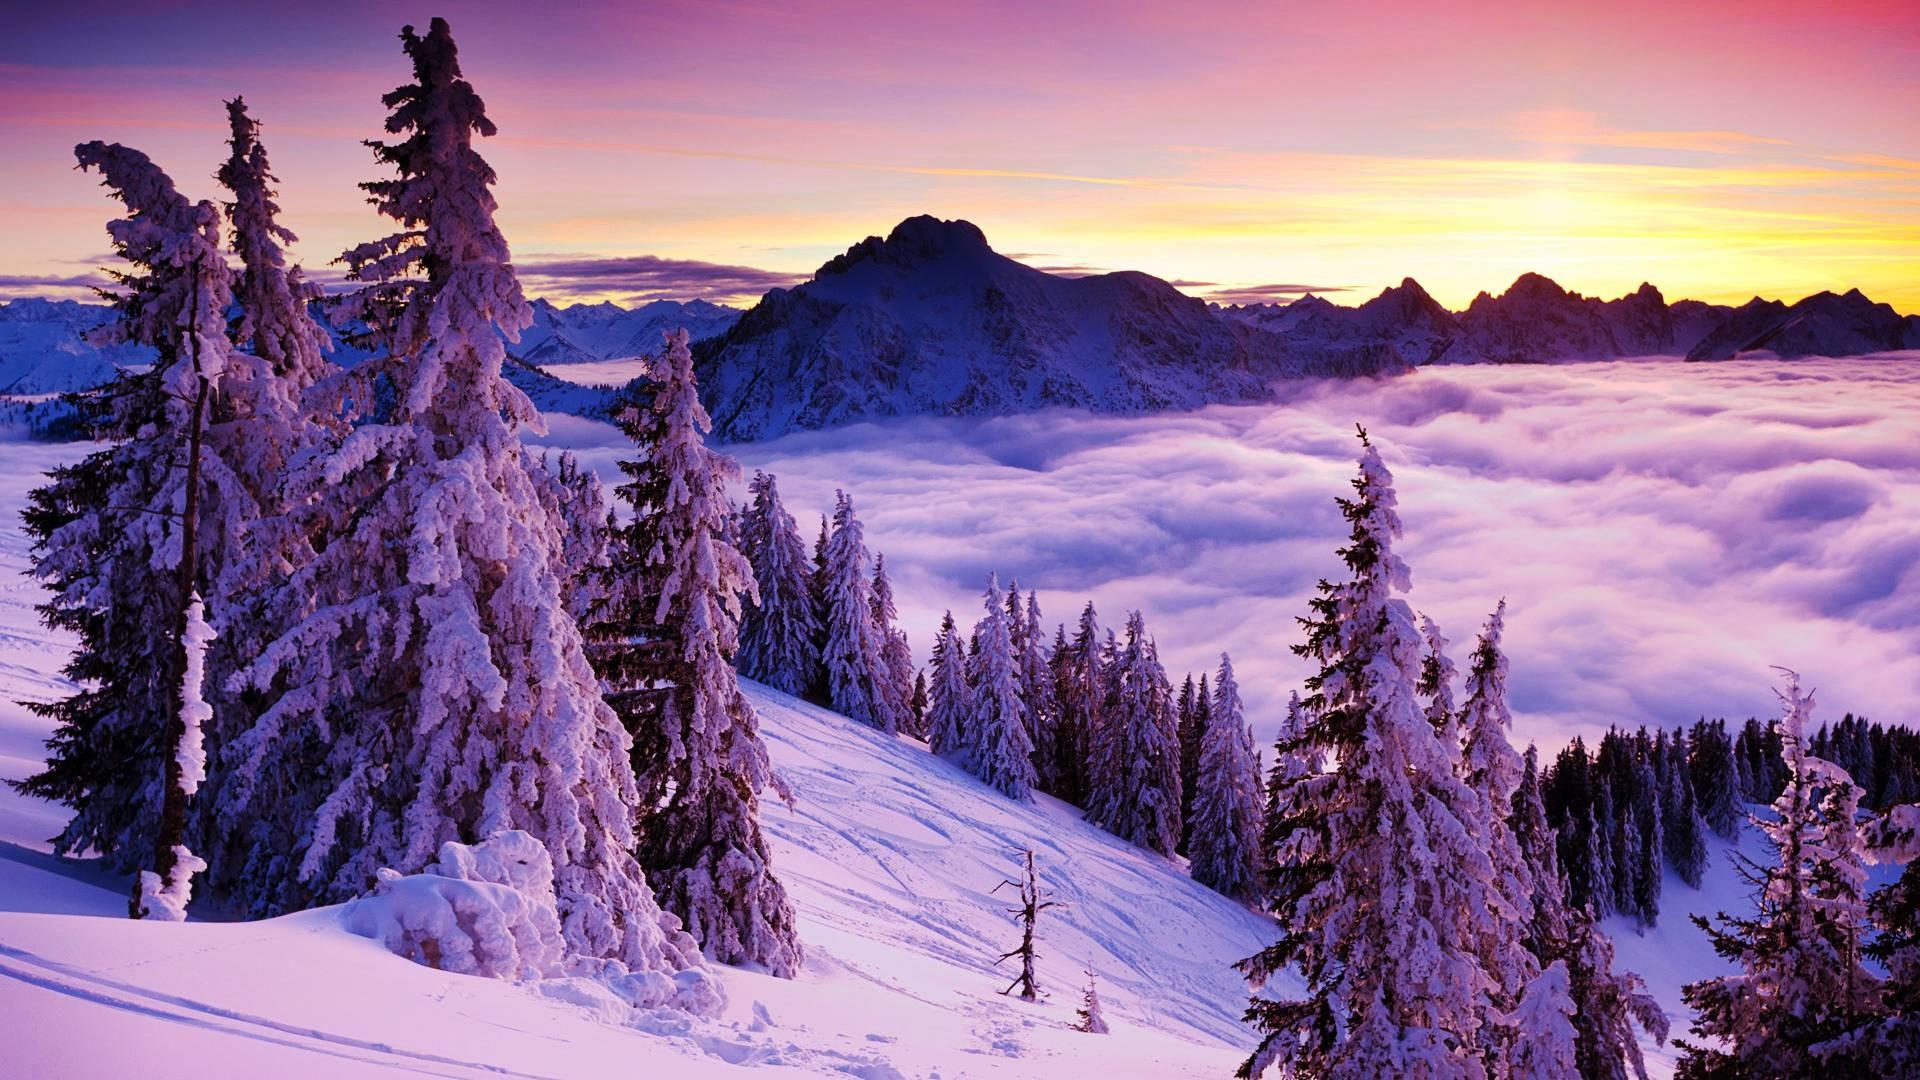 Beautiful Winter Landscape Wallpaper – Cool HD Wallpapers